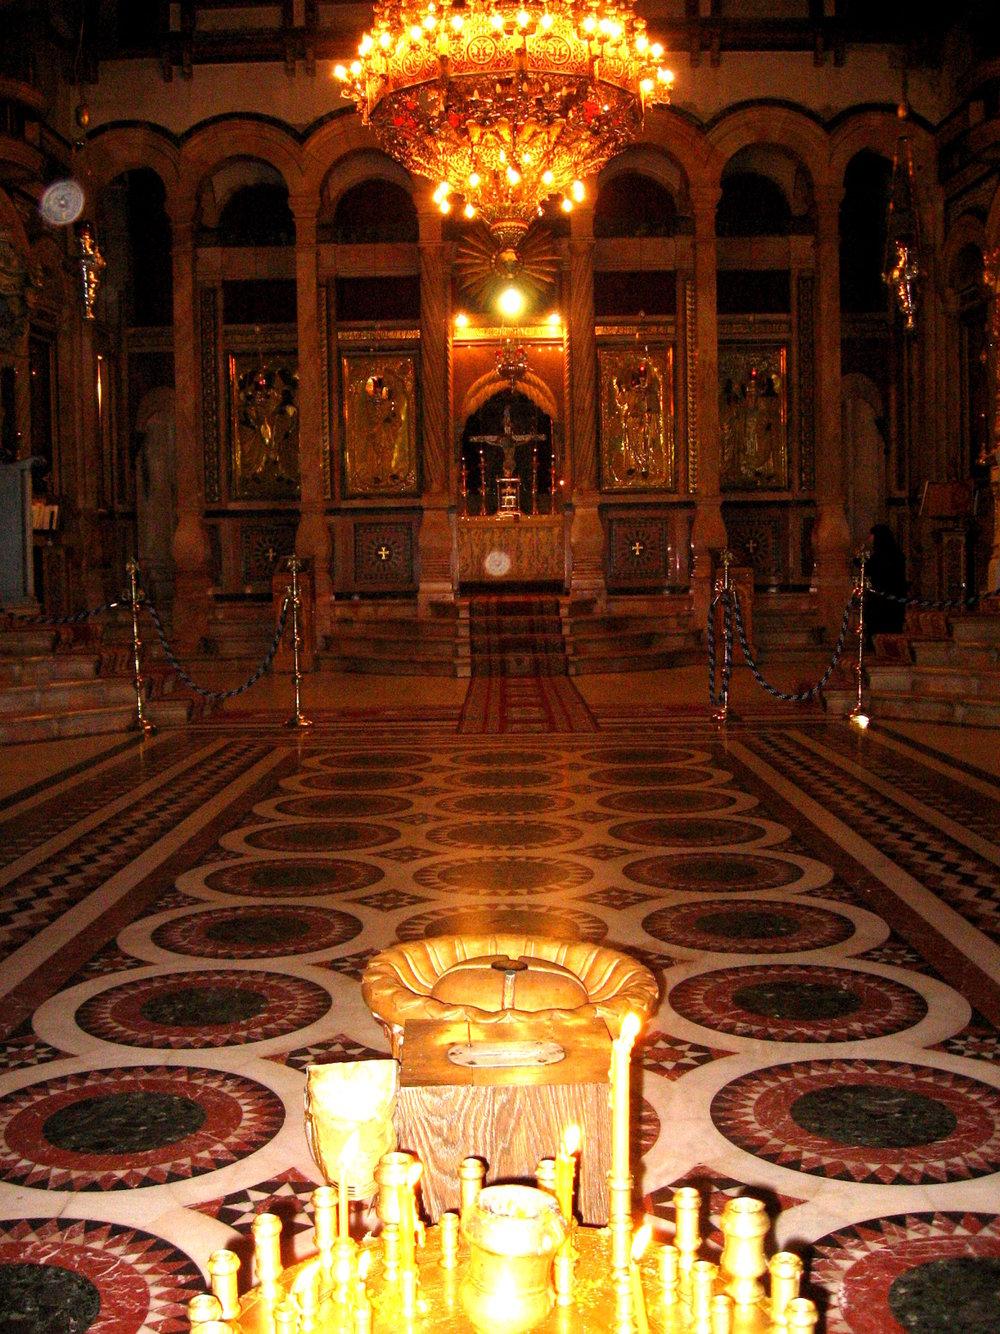 5291-20080123-jerusalem-holy-sepulchre-catholicon.jpg